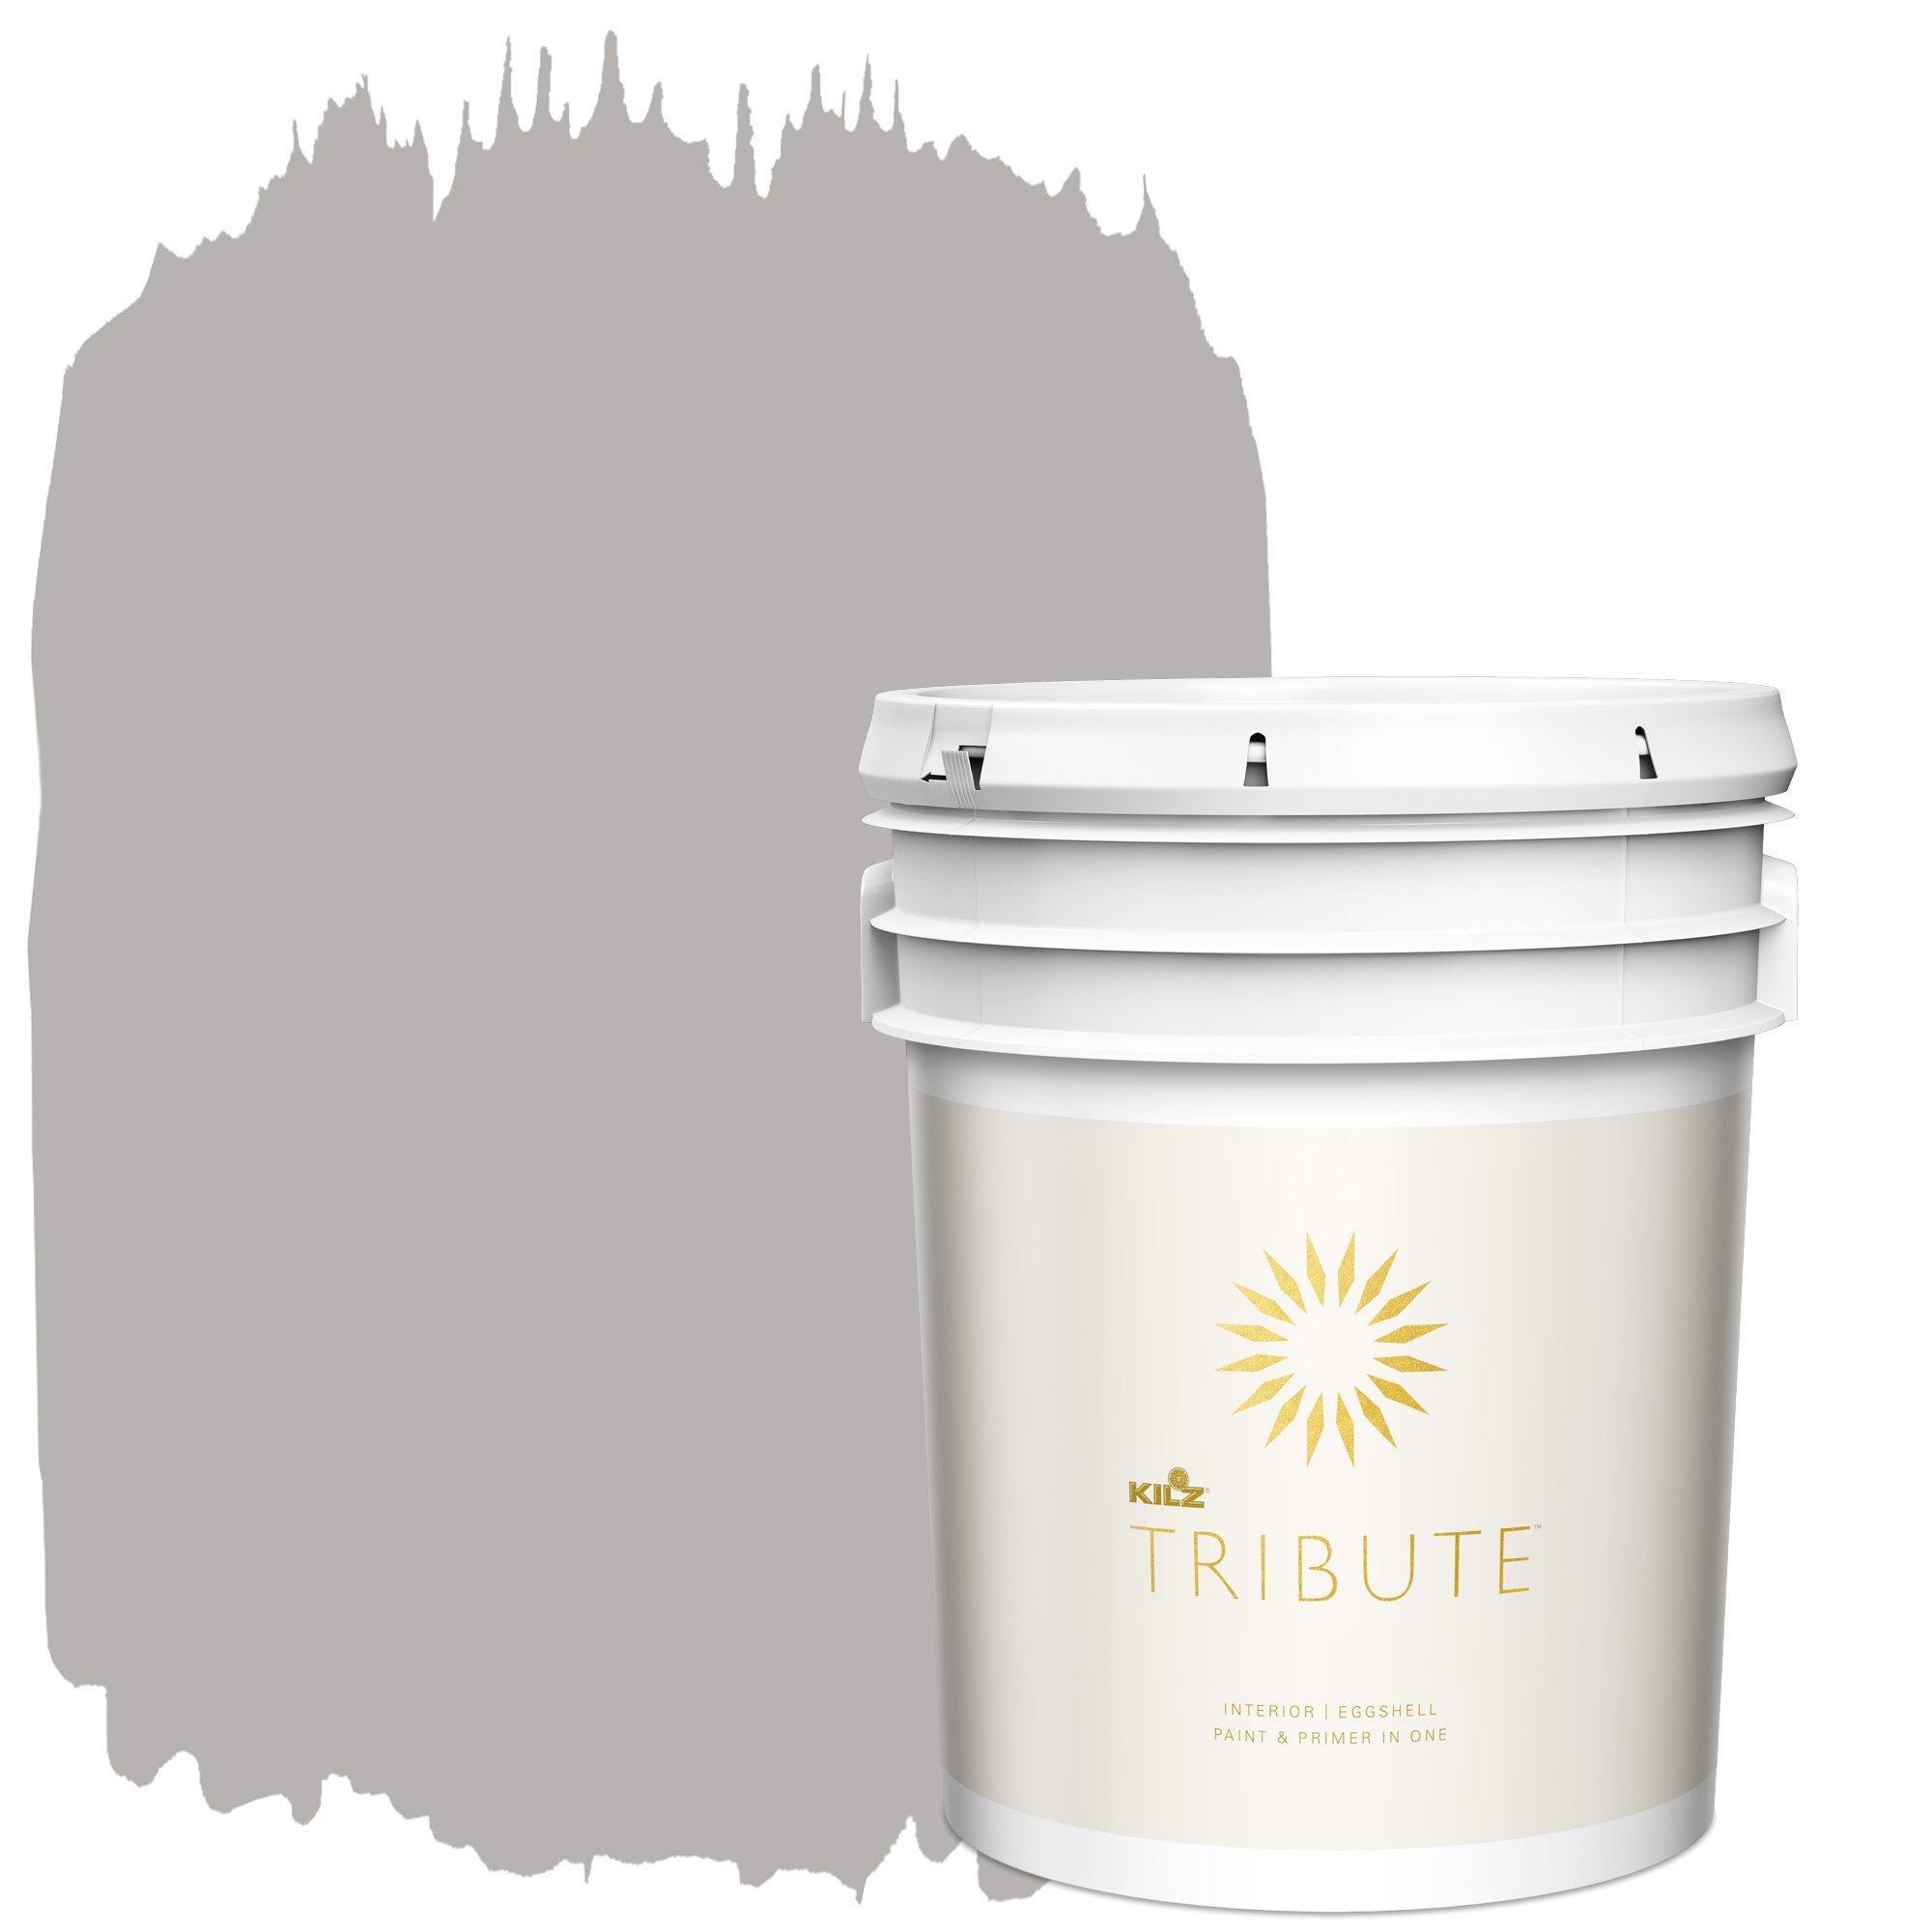 KILZ TRIBUTE Interior Eggshell Paint and Primer in One, 5 Gallon, Postcard (TB-25)